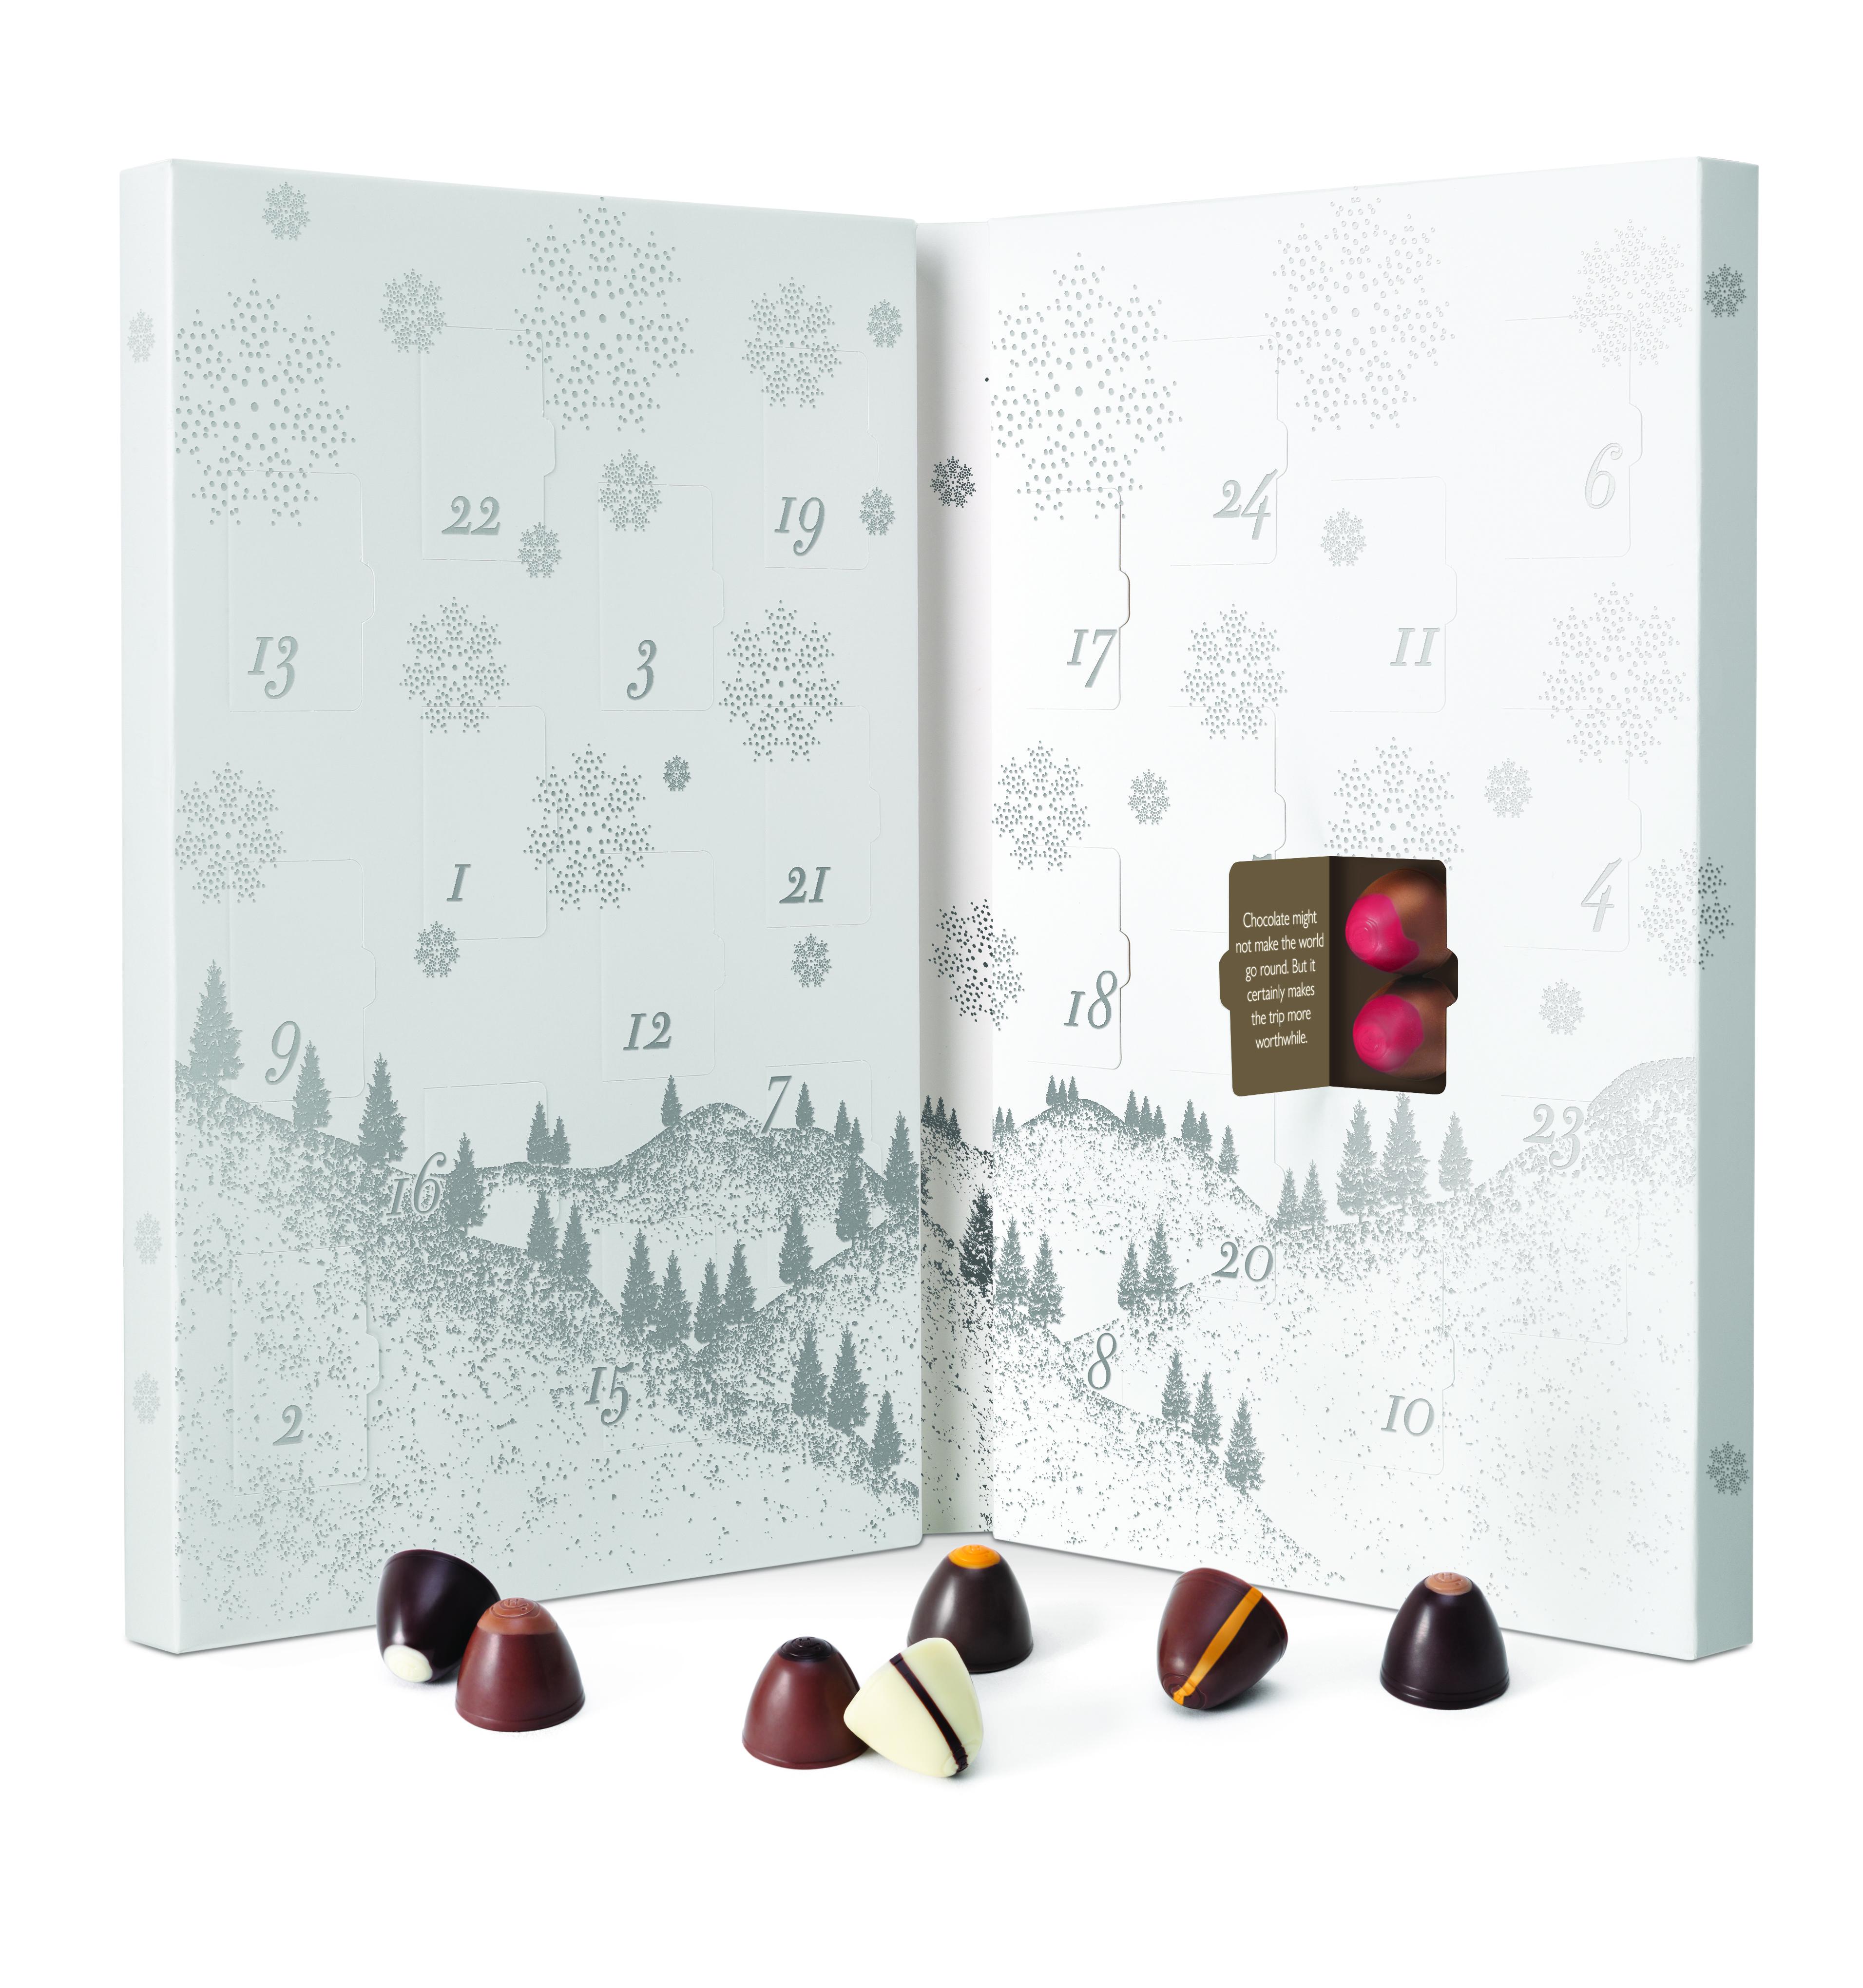 Advent Calendar Romantic Ideas : Your romantic christmas countdown love our wedding